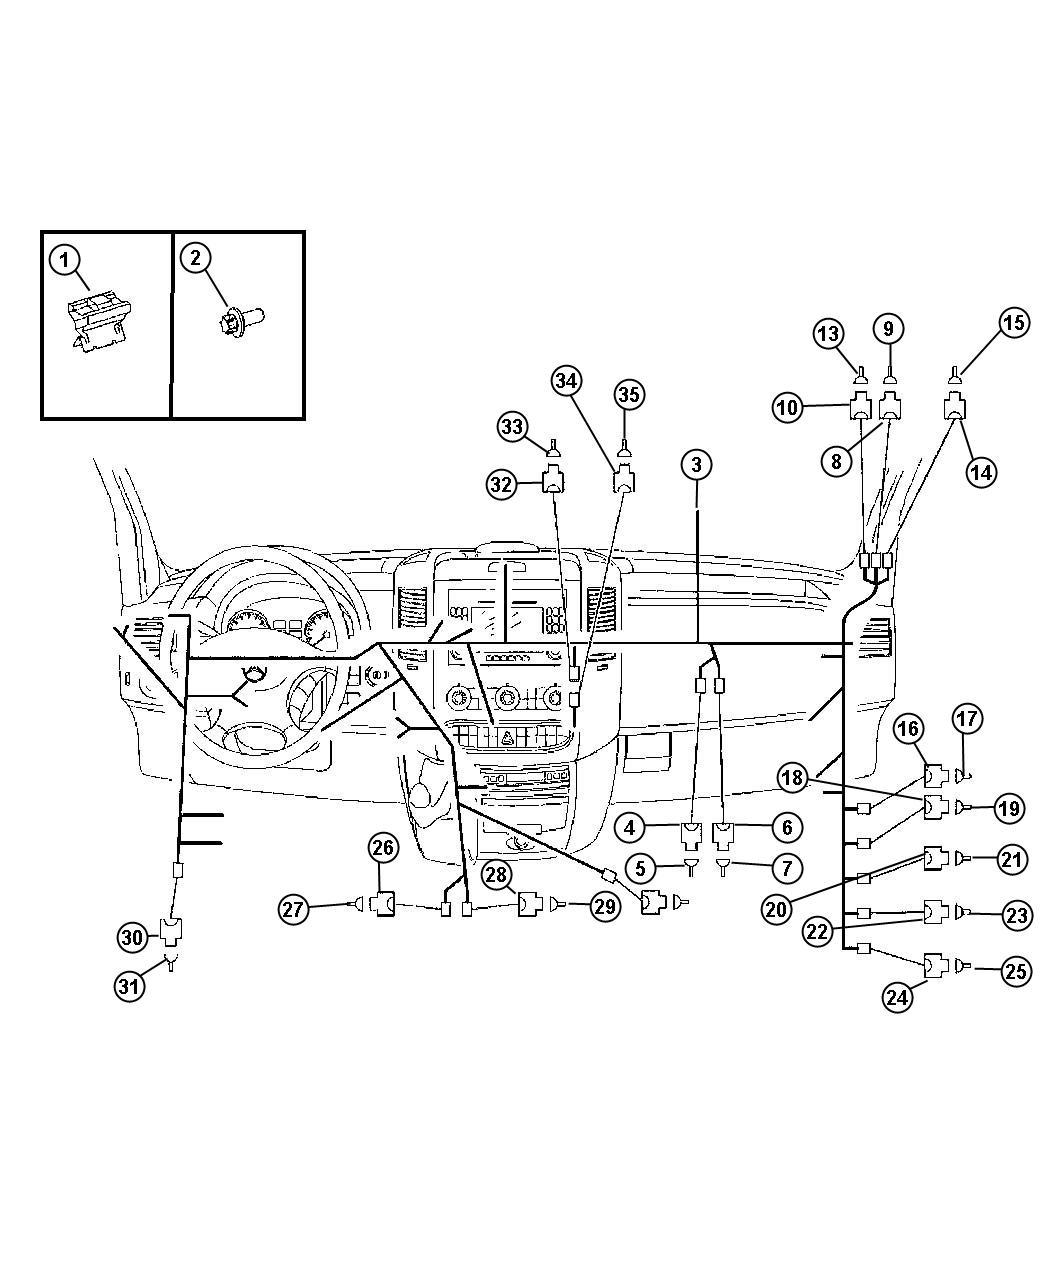 2008 Dodge Sprinter 3500 Connector  Wiring  Pin  Body